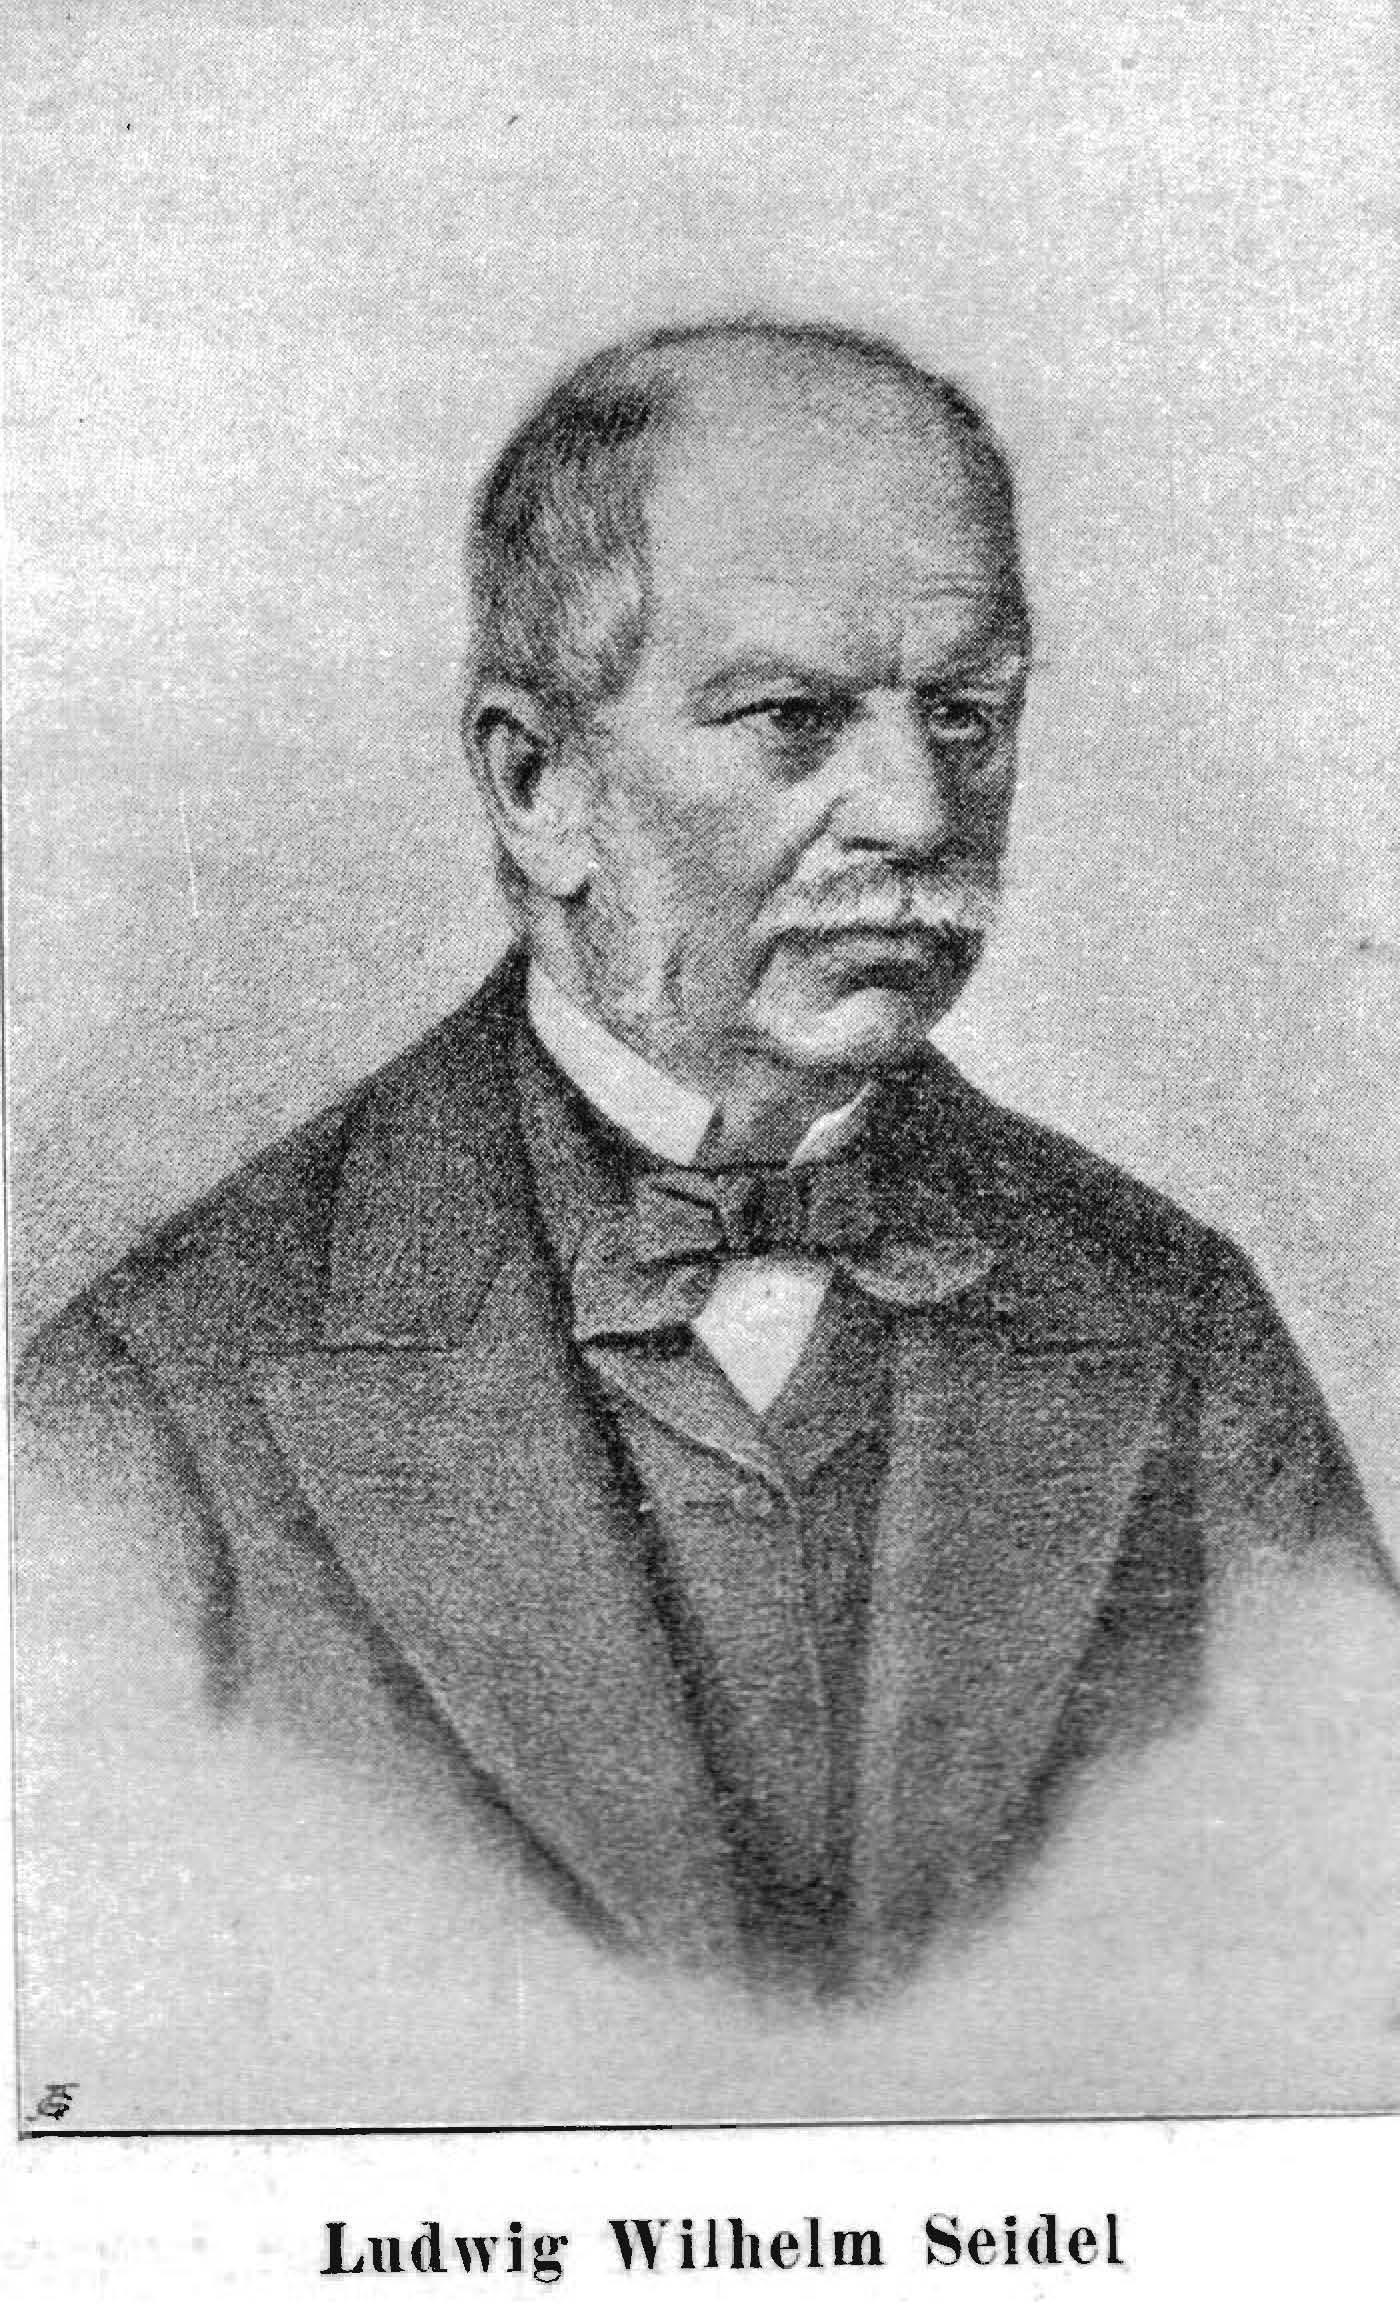 Ludwig Wilhelm Seidel